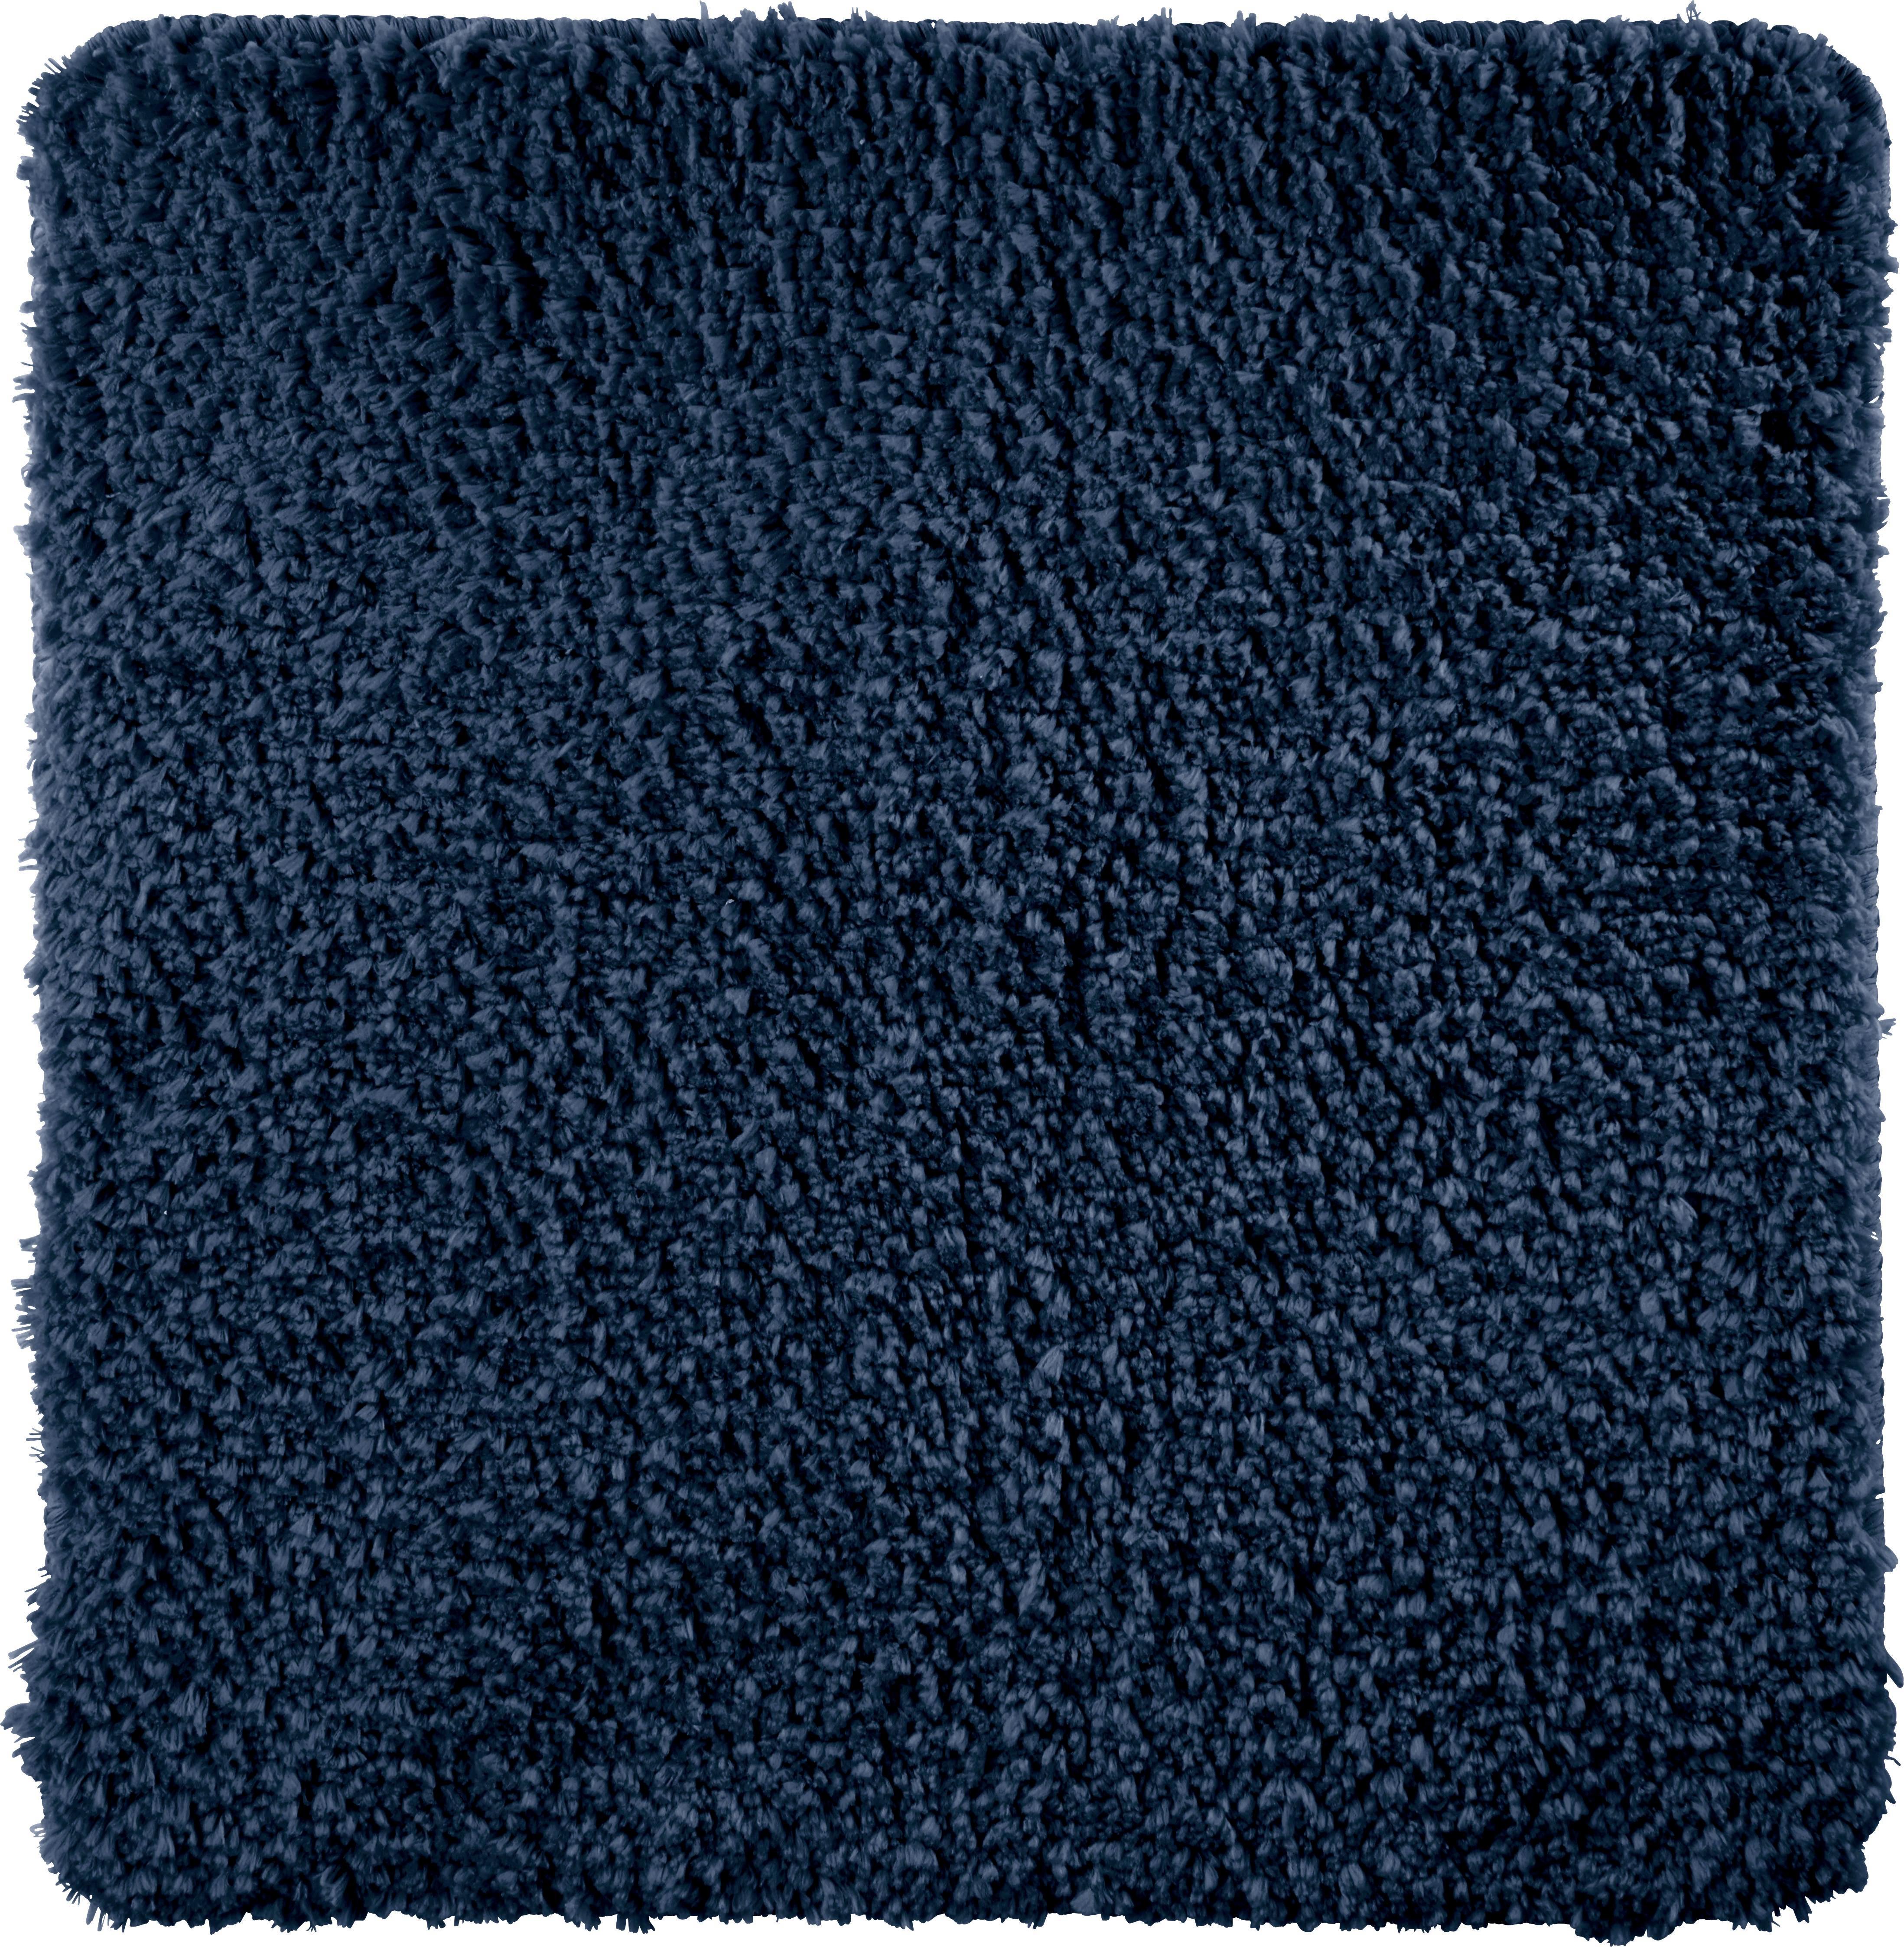 Badematte Christina ca. 50x50cm - Blau, Textil (50/50cm) - MÖMAX modern living